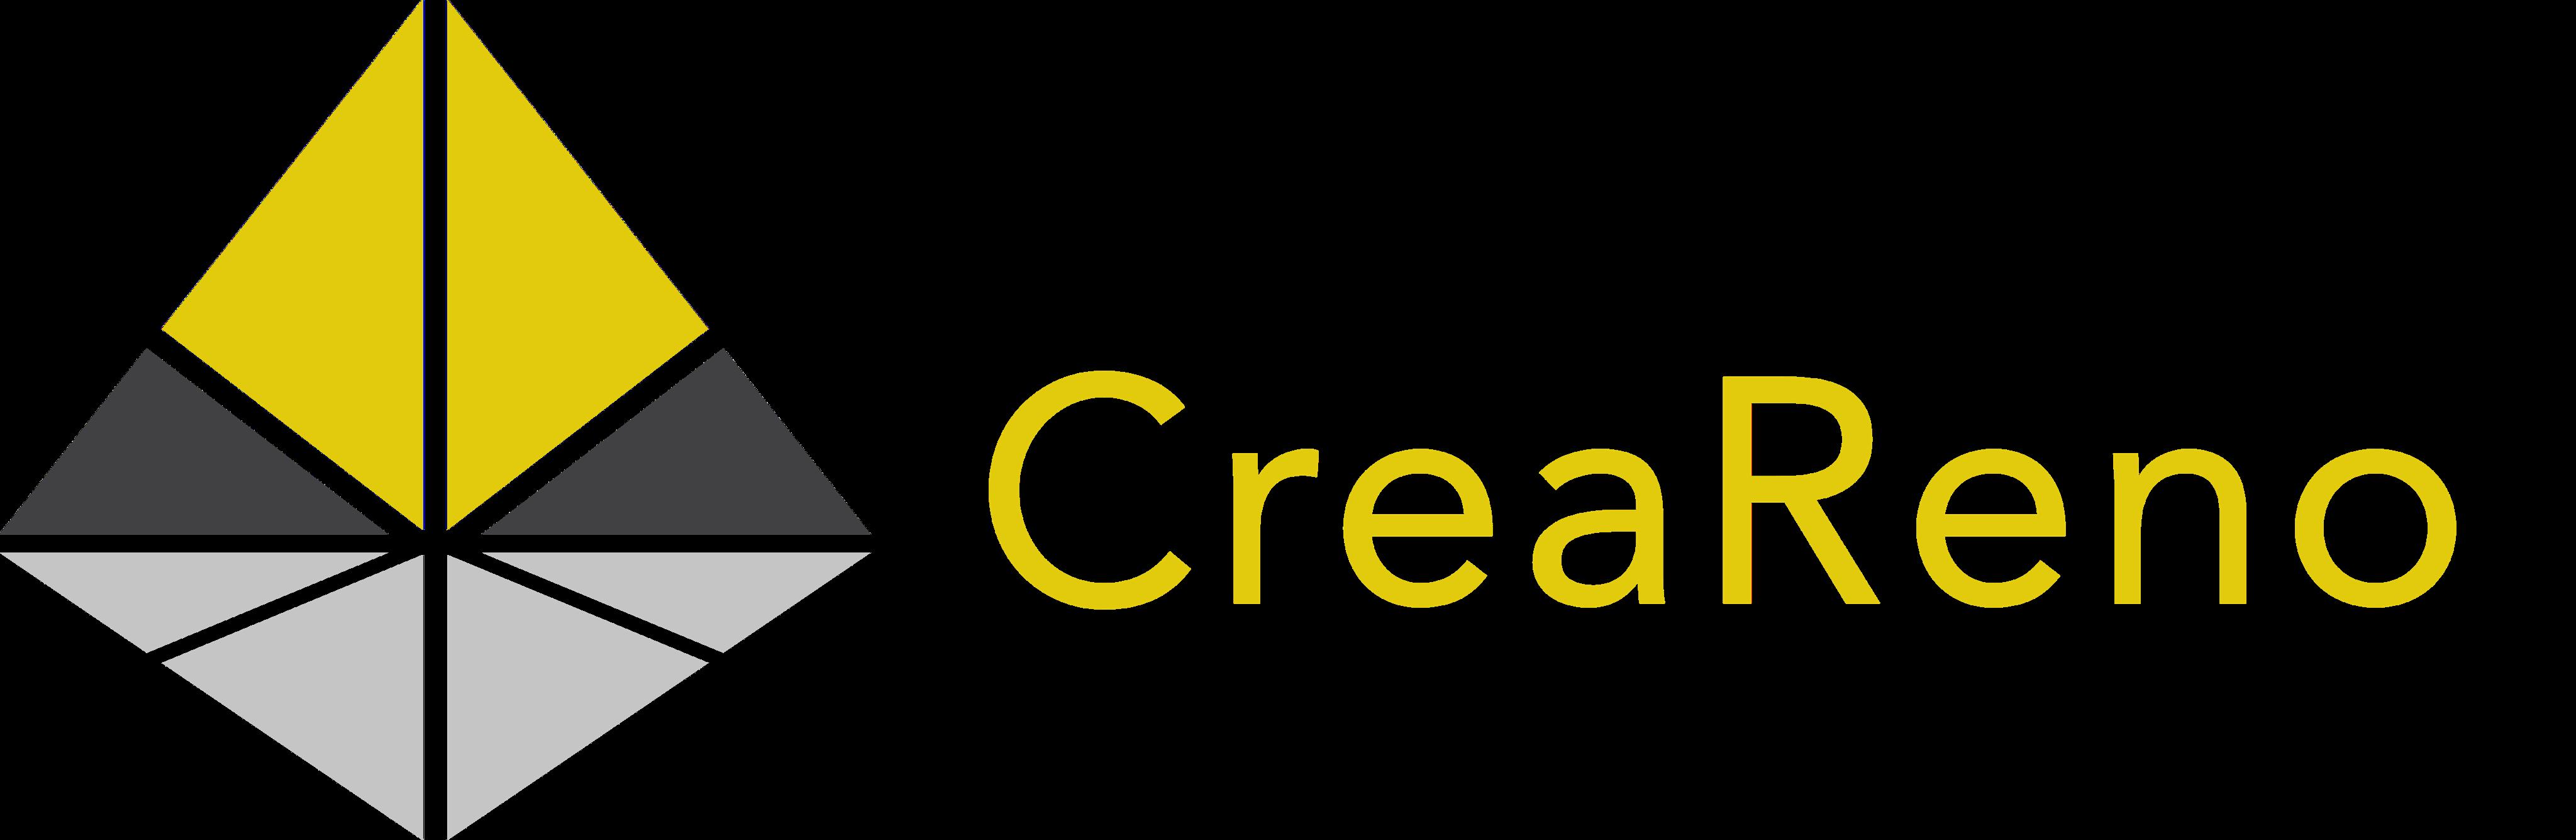 CreaReno